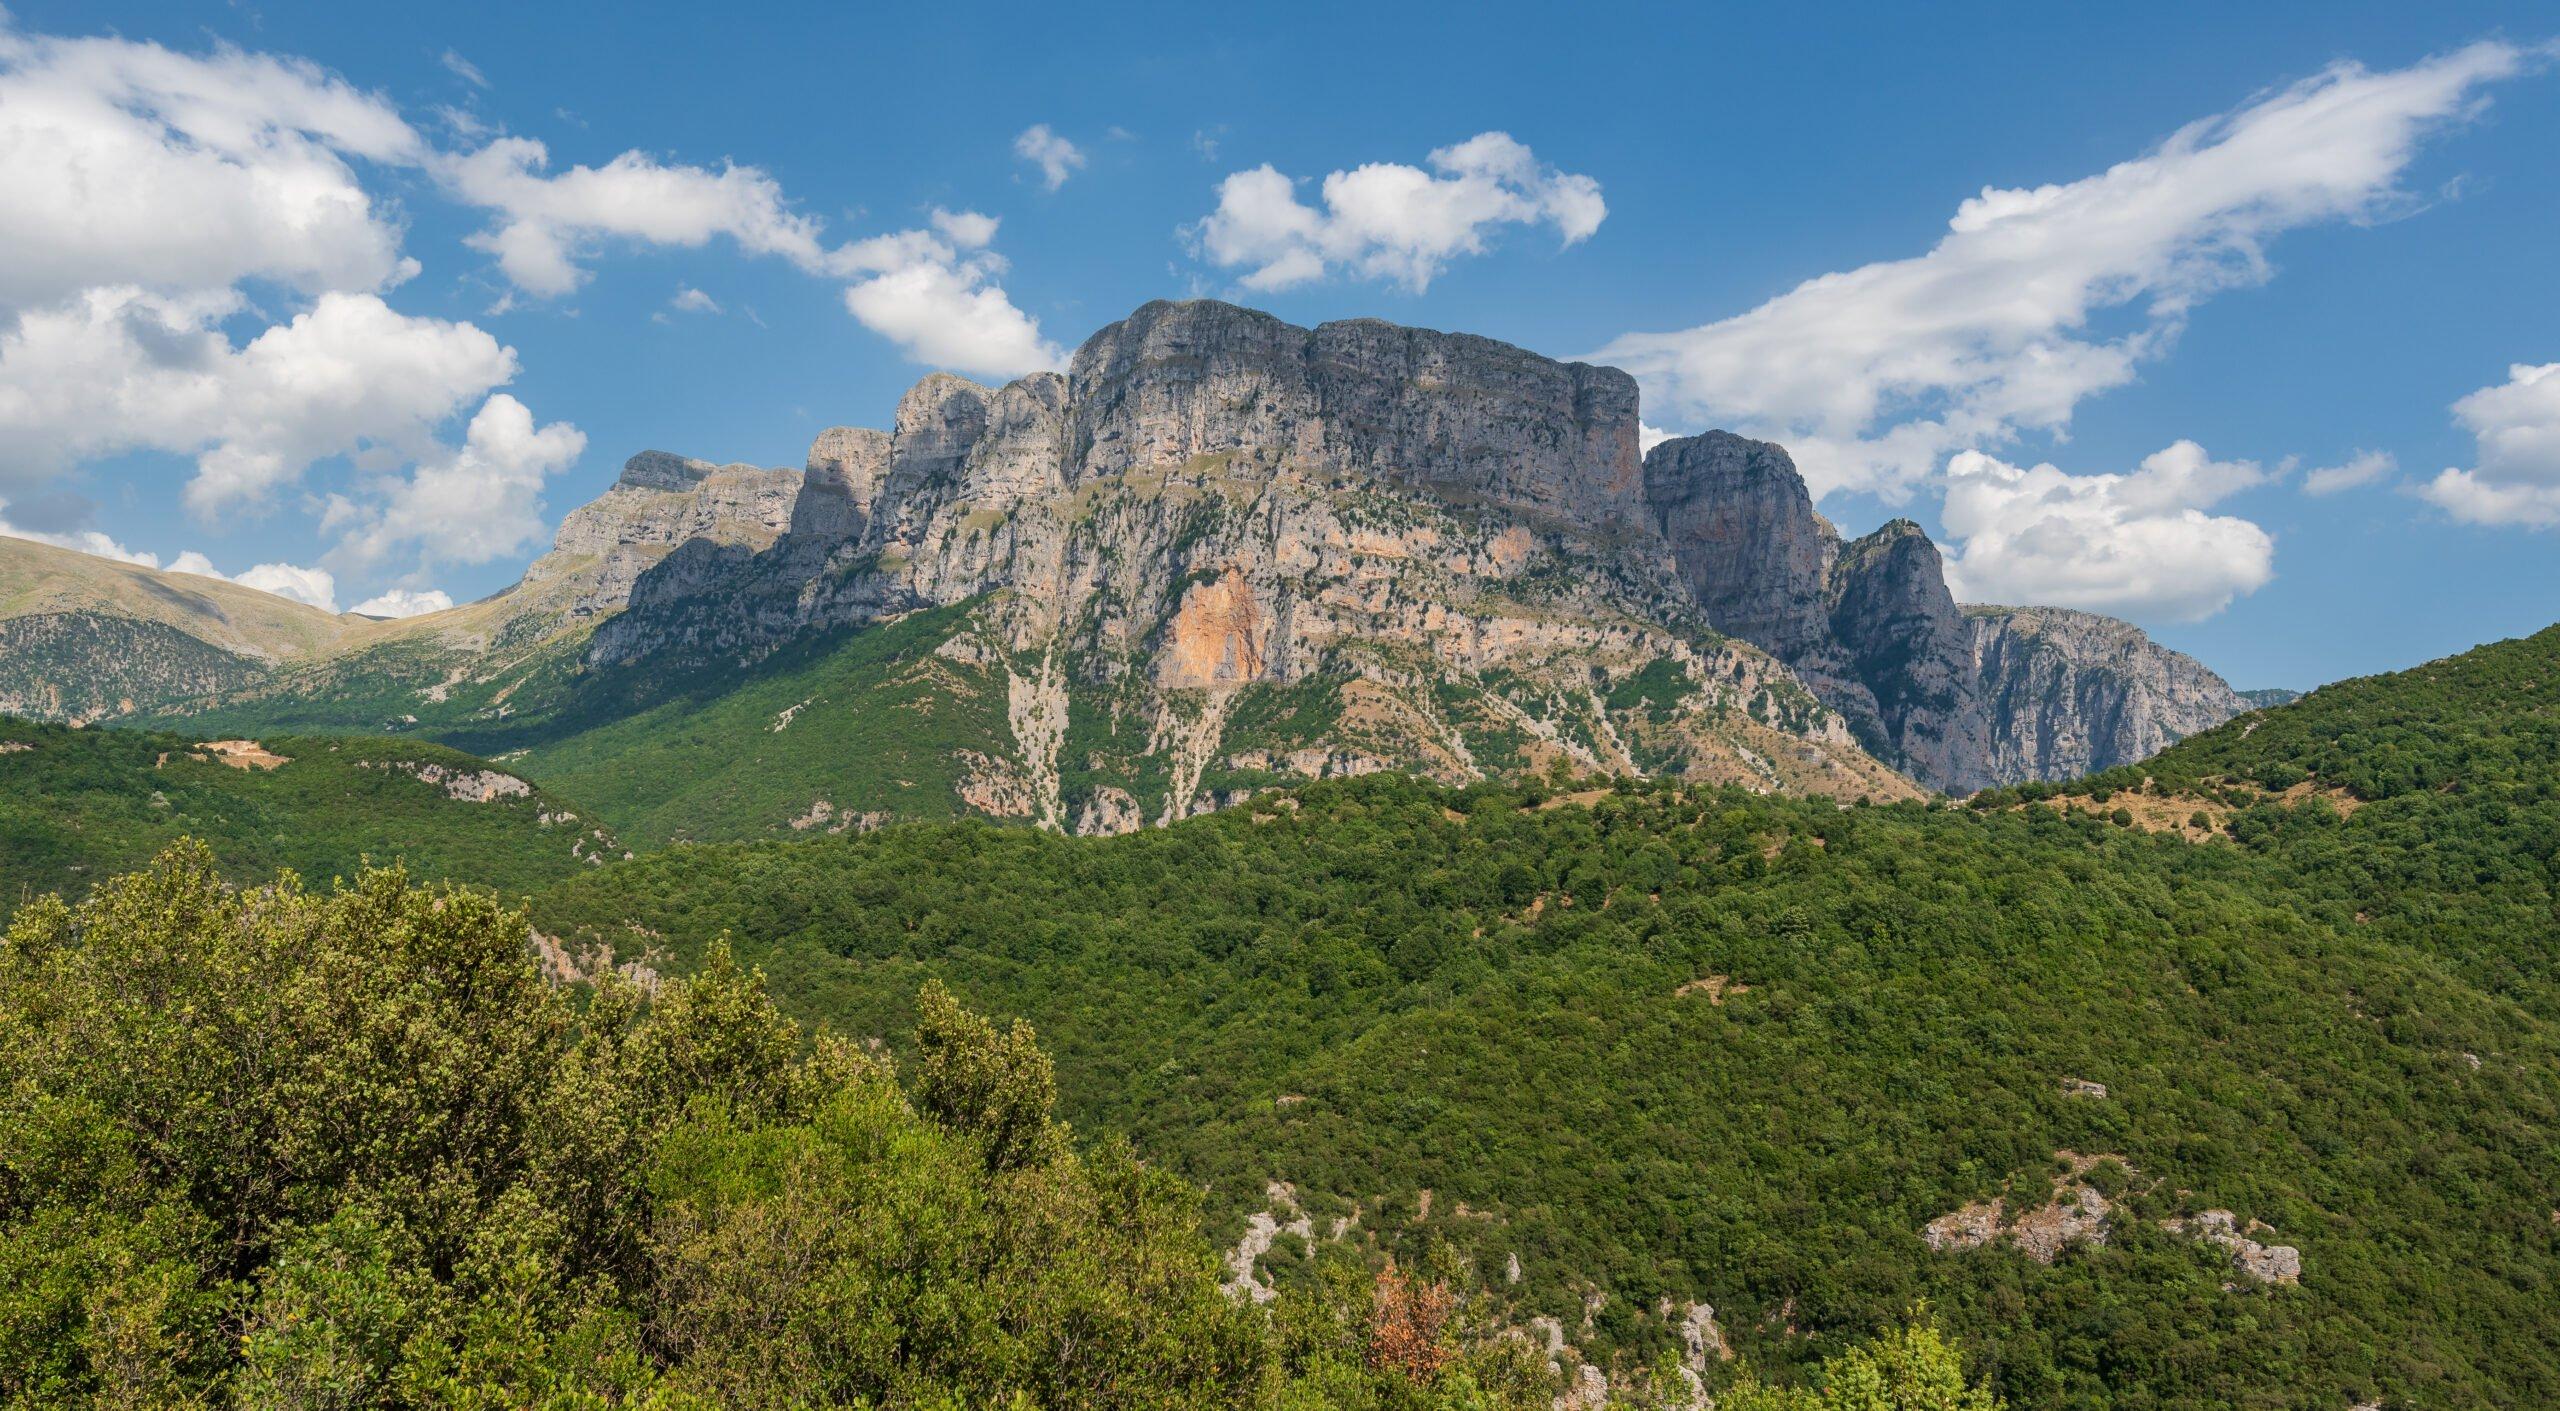 Admire The Mountain Views On The Alpine Dragonlake Hiking Tour From Papigko Village - Ioannina